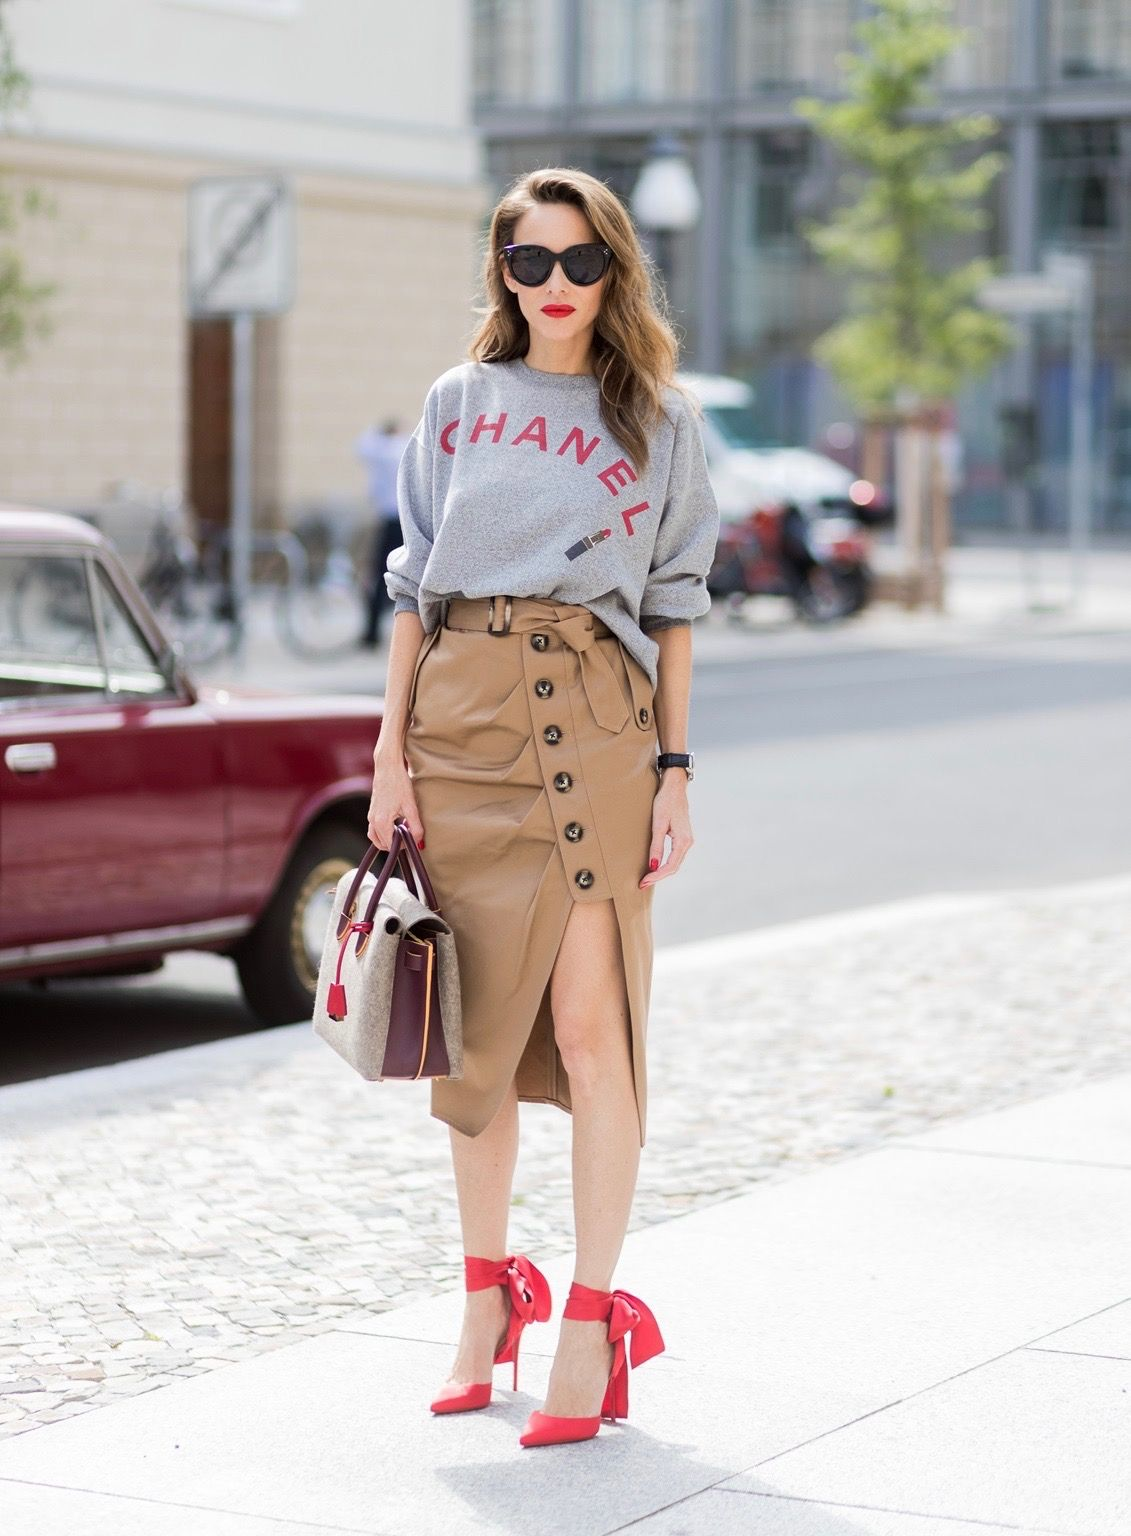 1d9510de Alexandra Lapp (model, blogger) wearing a vintage sweater from Chanel, a  midi